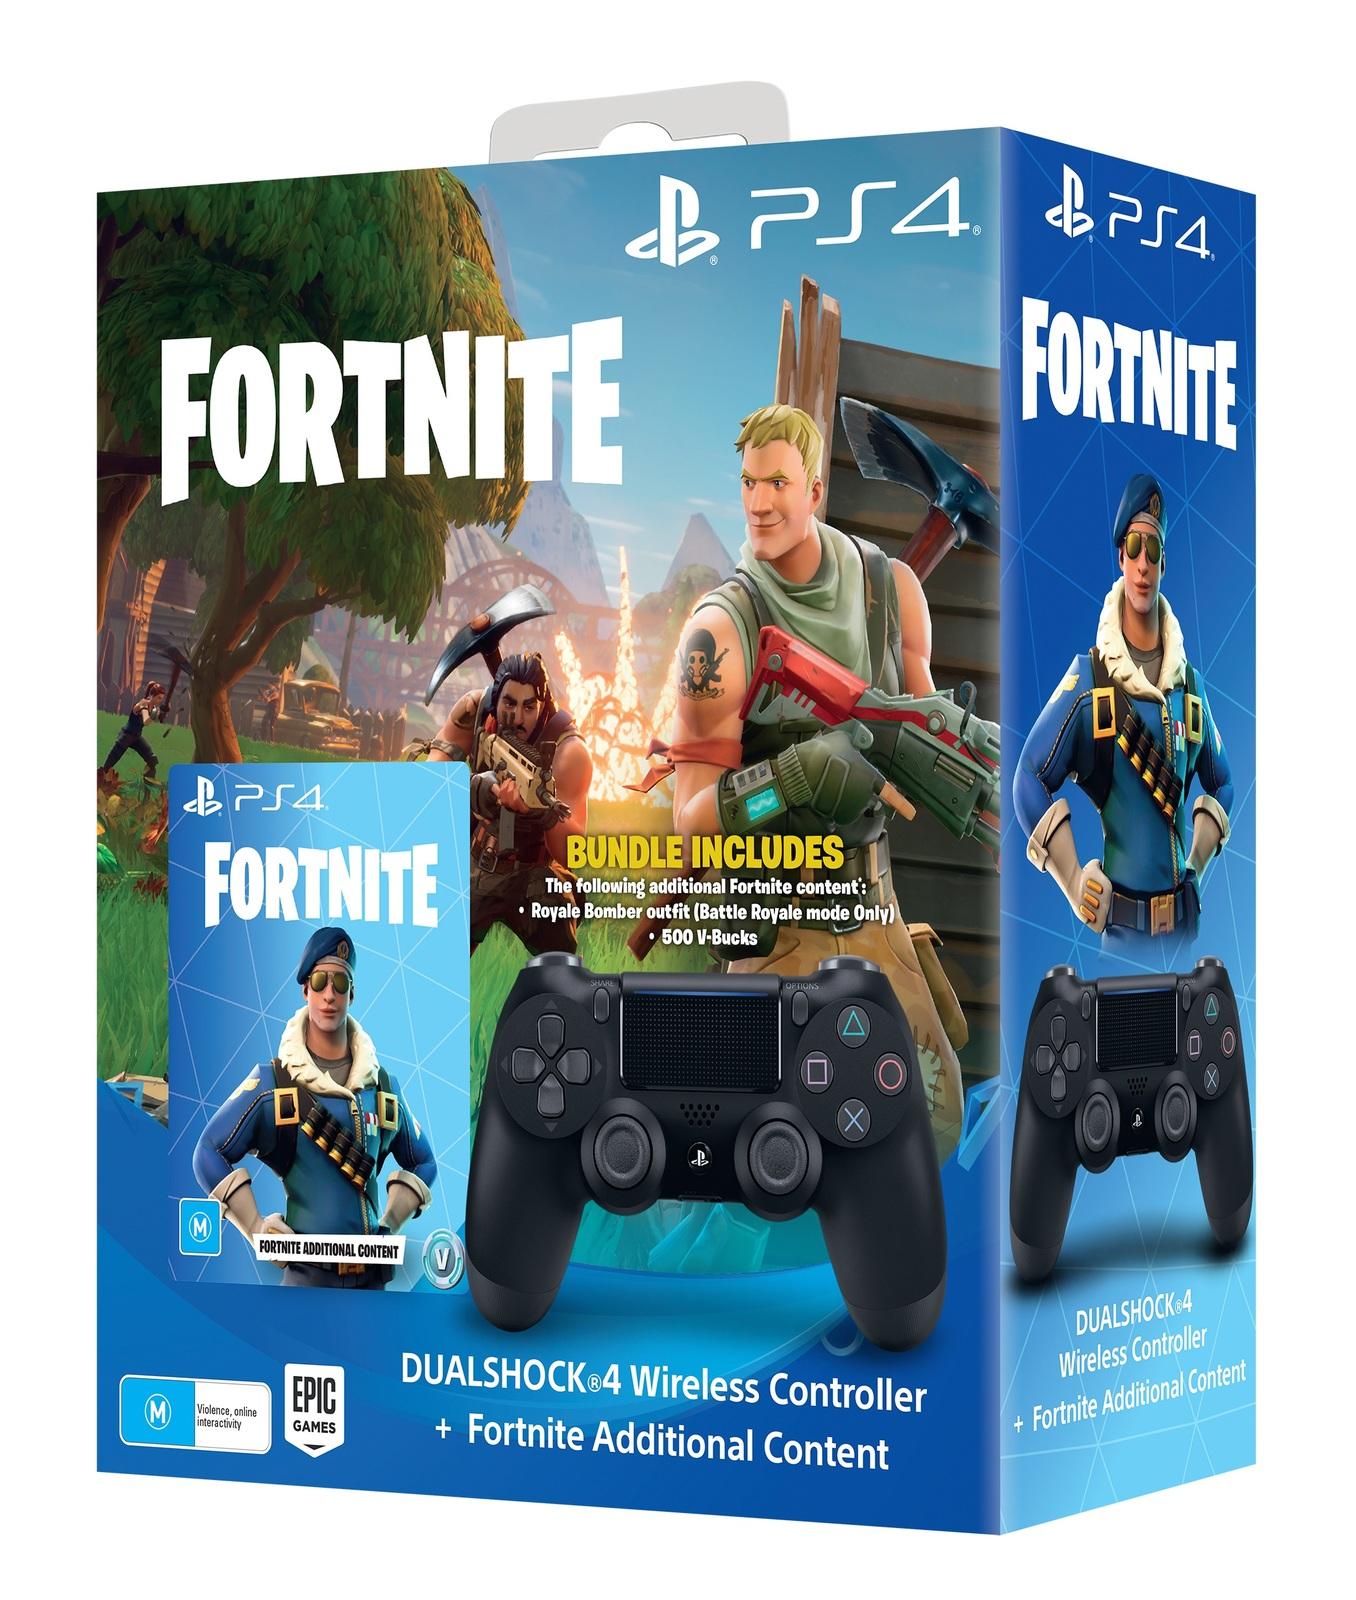 c83c227d15dd7 PlayStation 4 Dual Shock 4 v2 Wireless Controller - Fortnite Bundle for PS4  image